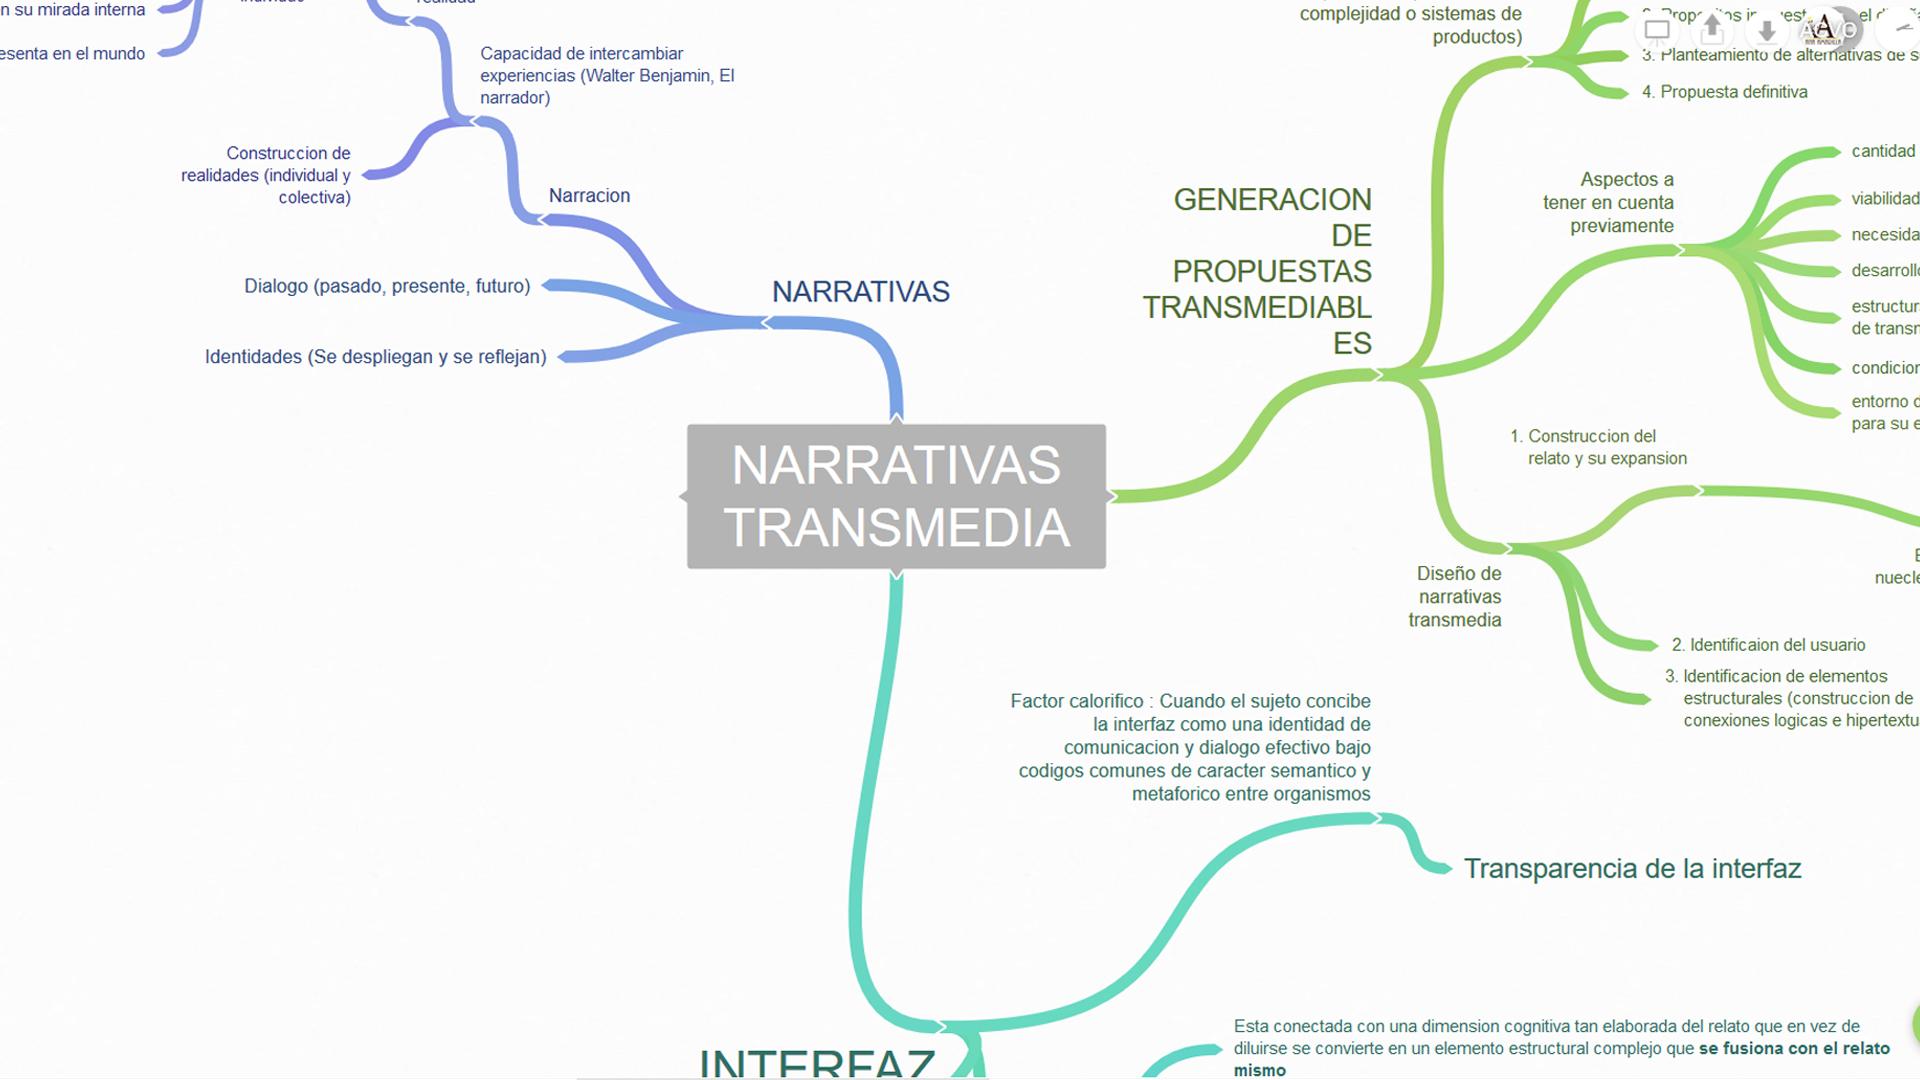 Modelo de construccion de narrativas transmedia